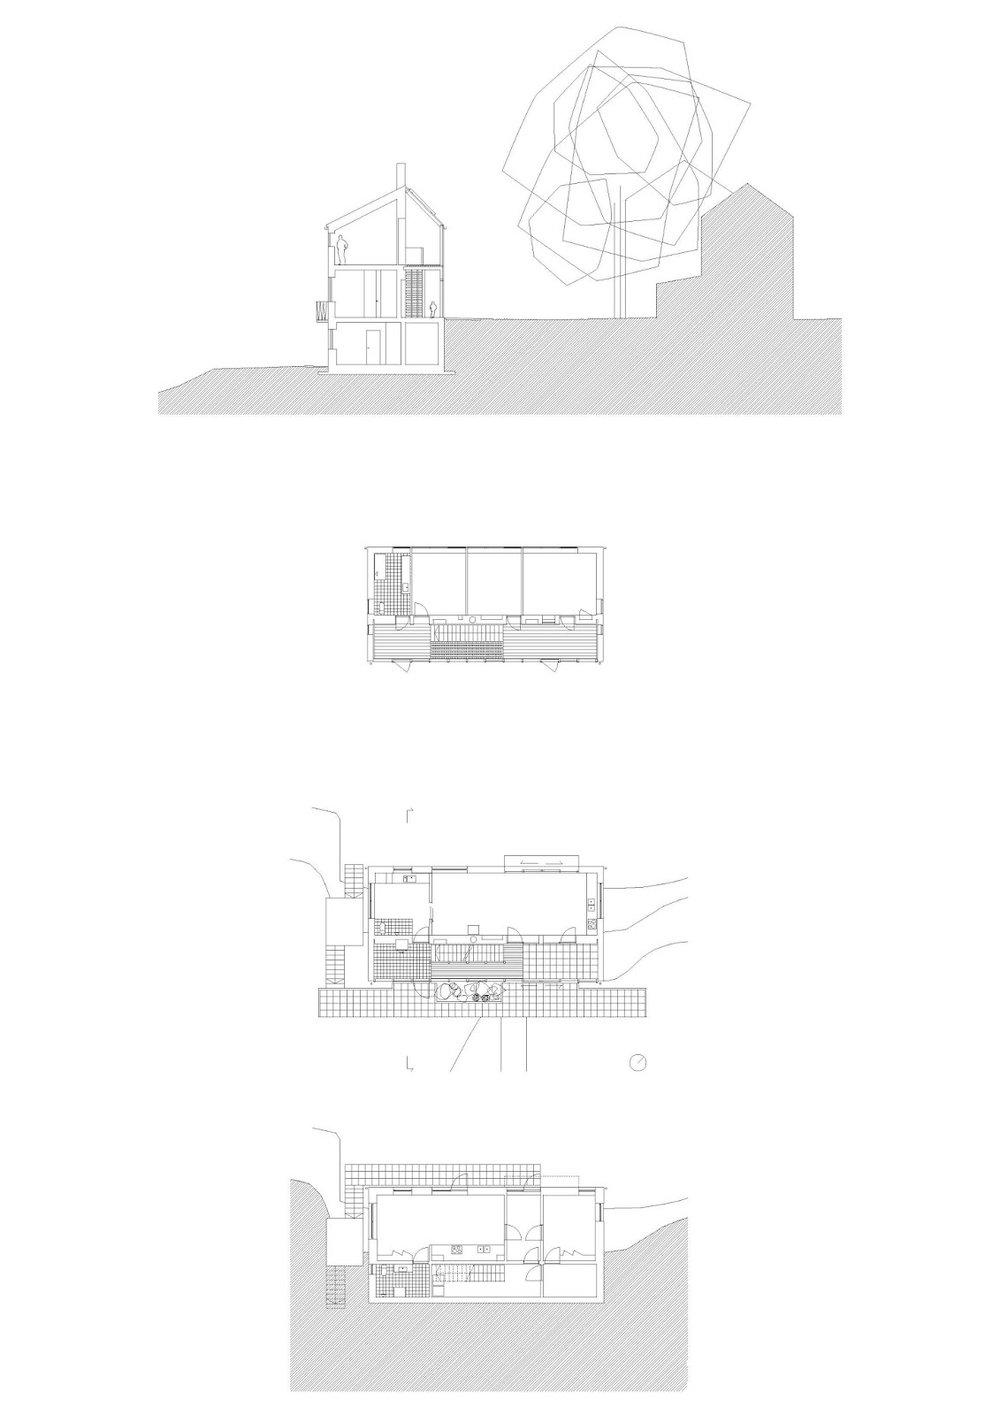 snitt/ 2.etasje/ bakkeplan / under-etasje